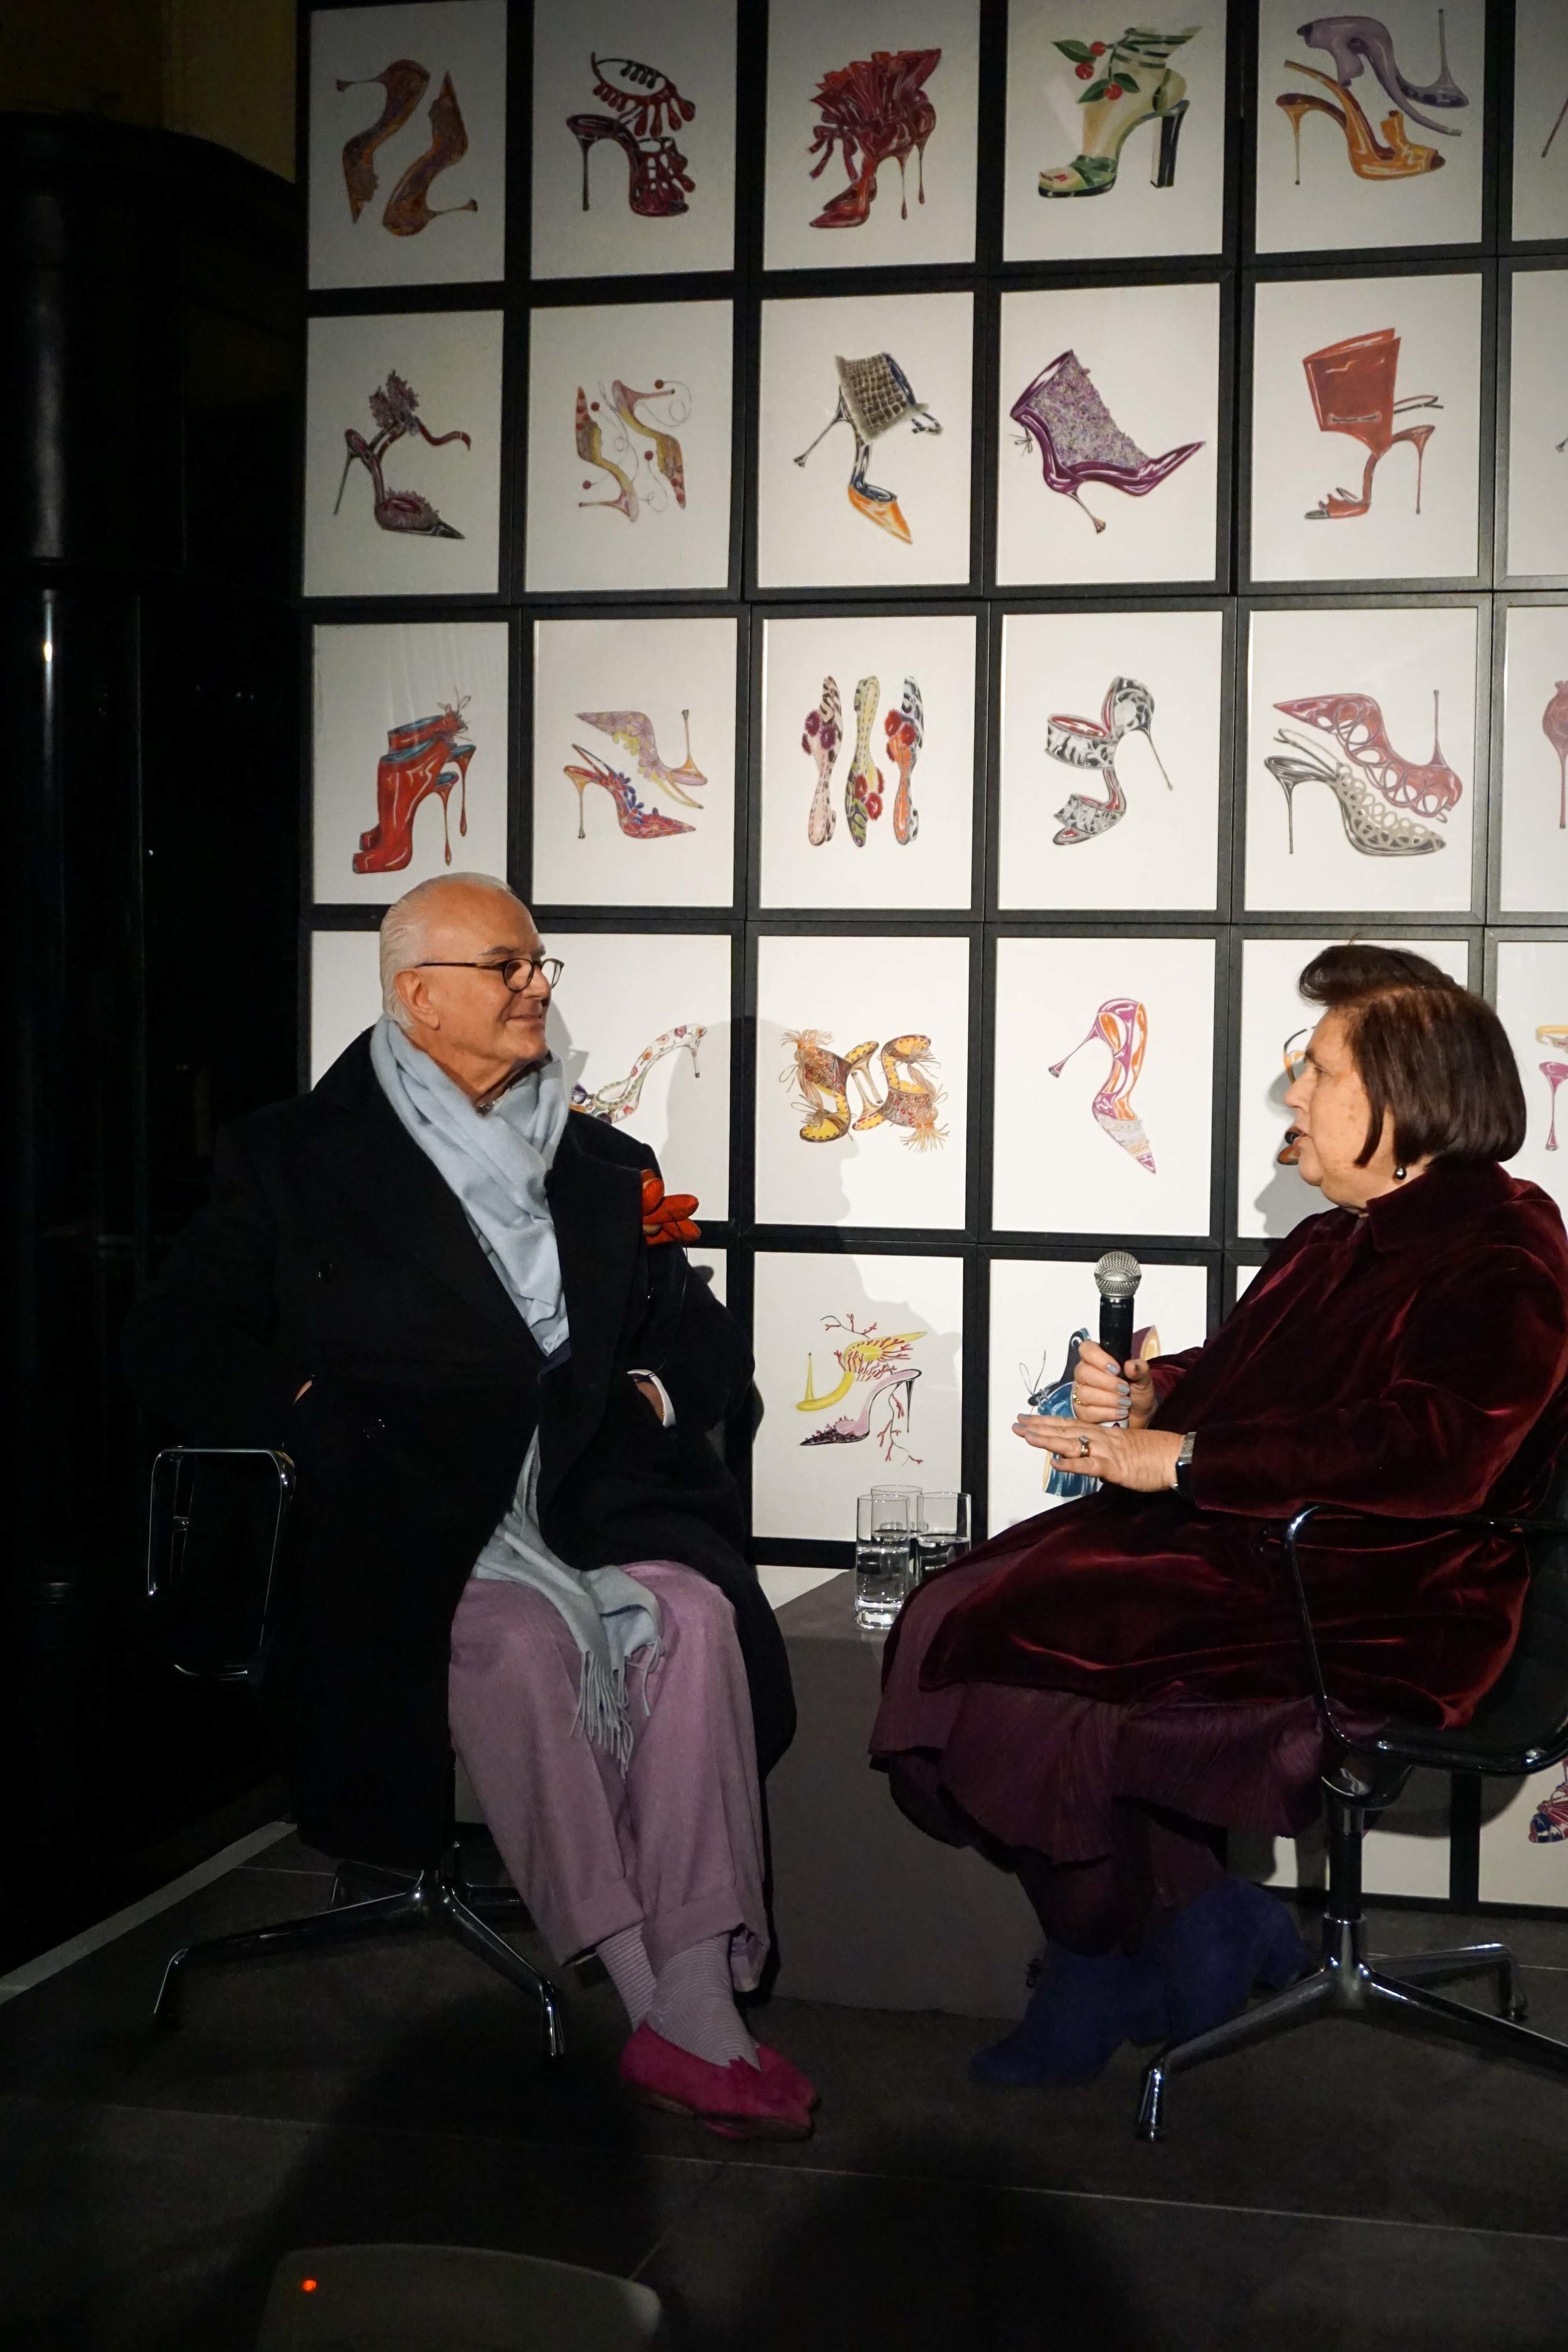 Manolo Blahnik speaking at the Press Release in the Burlington Arcade, Mayfair.